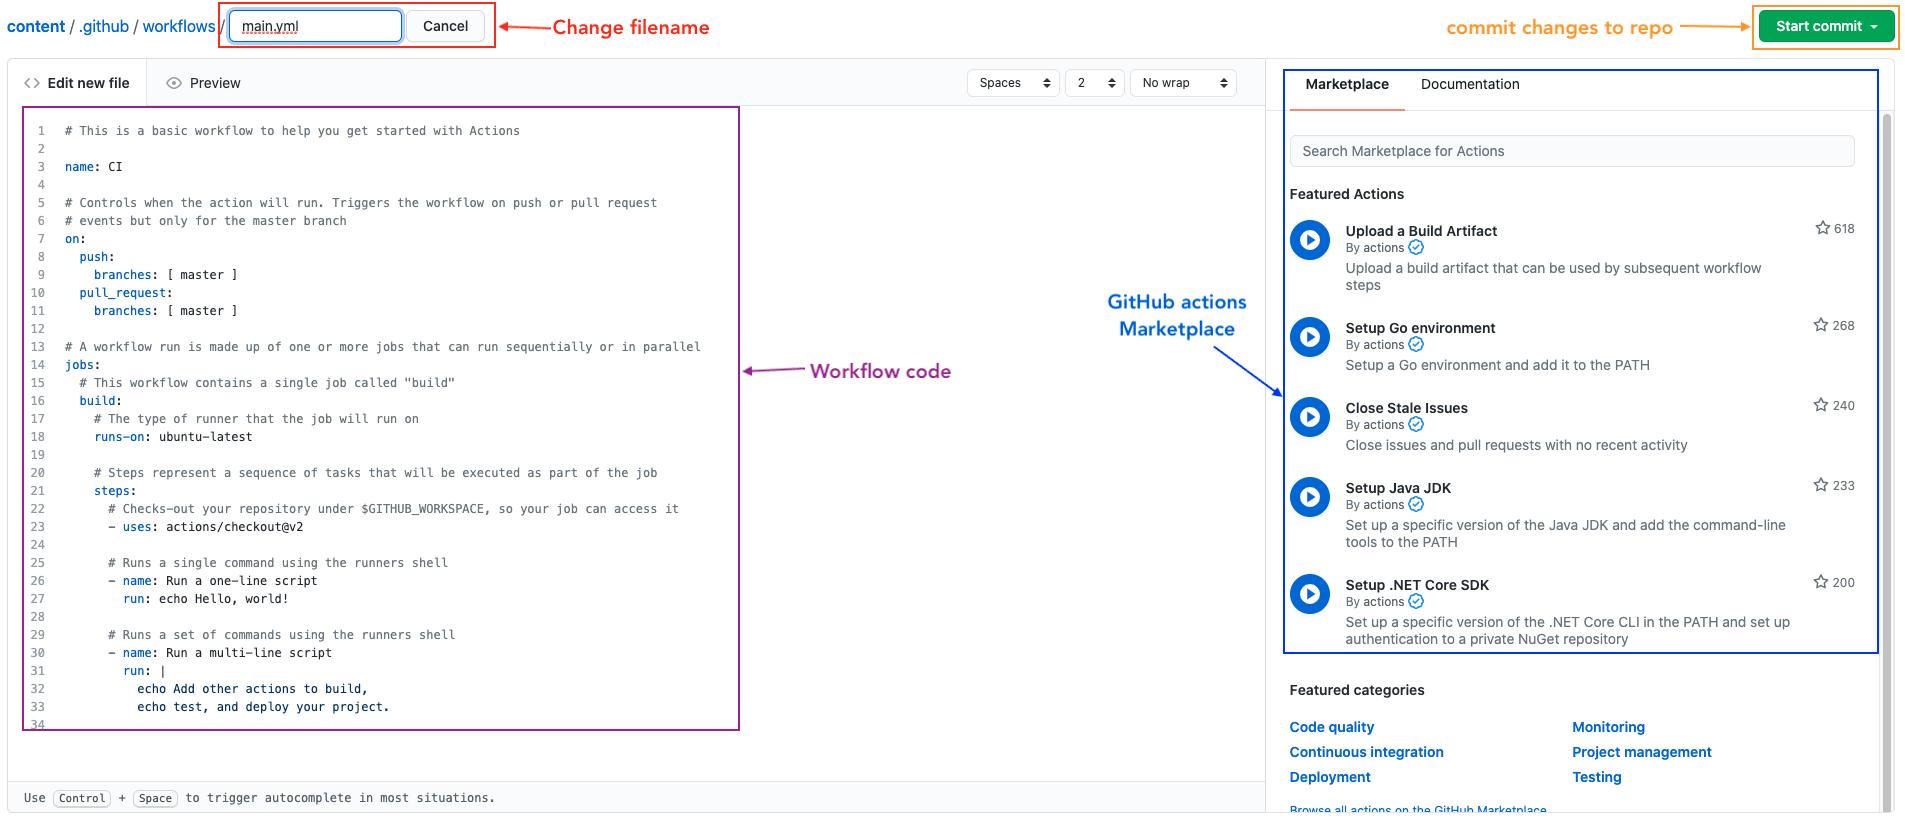 Edit workflow template